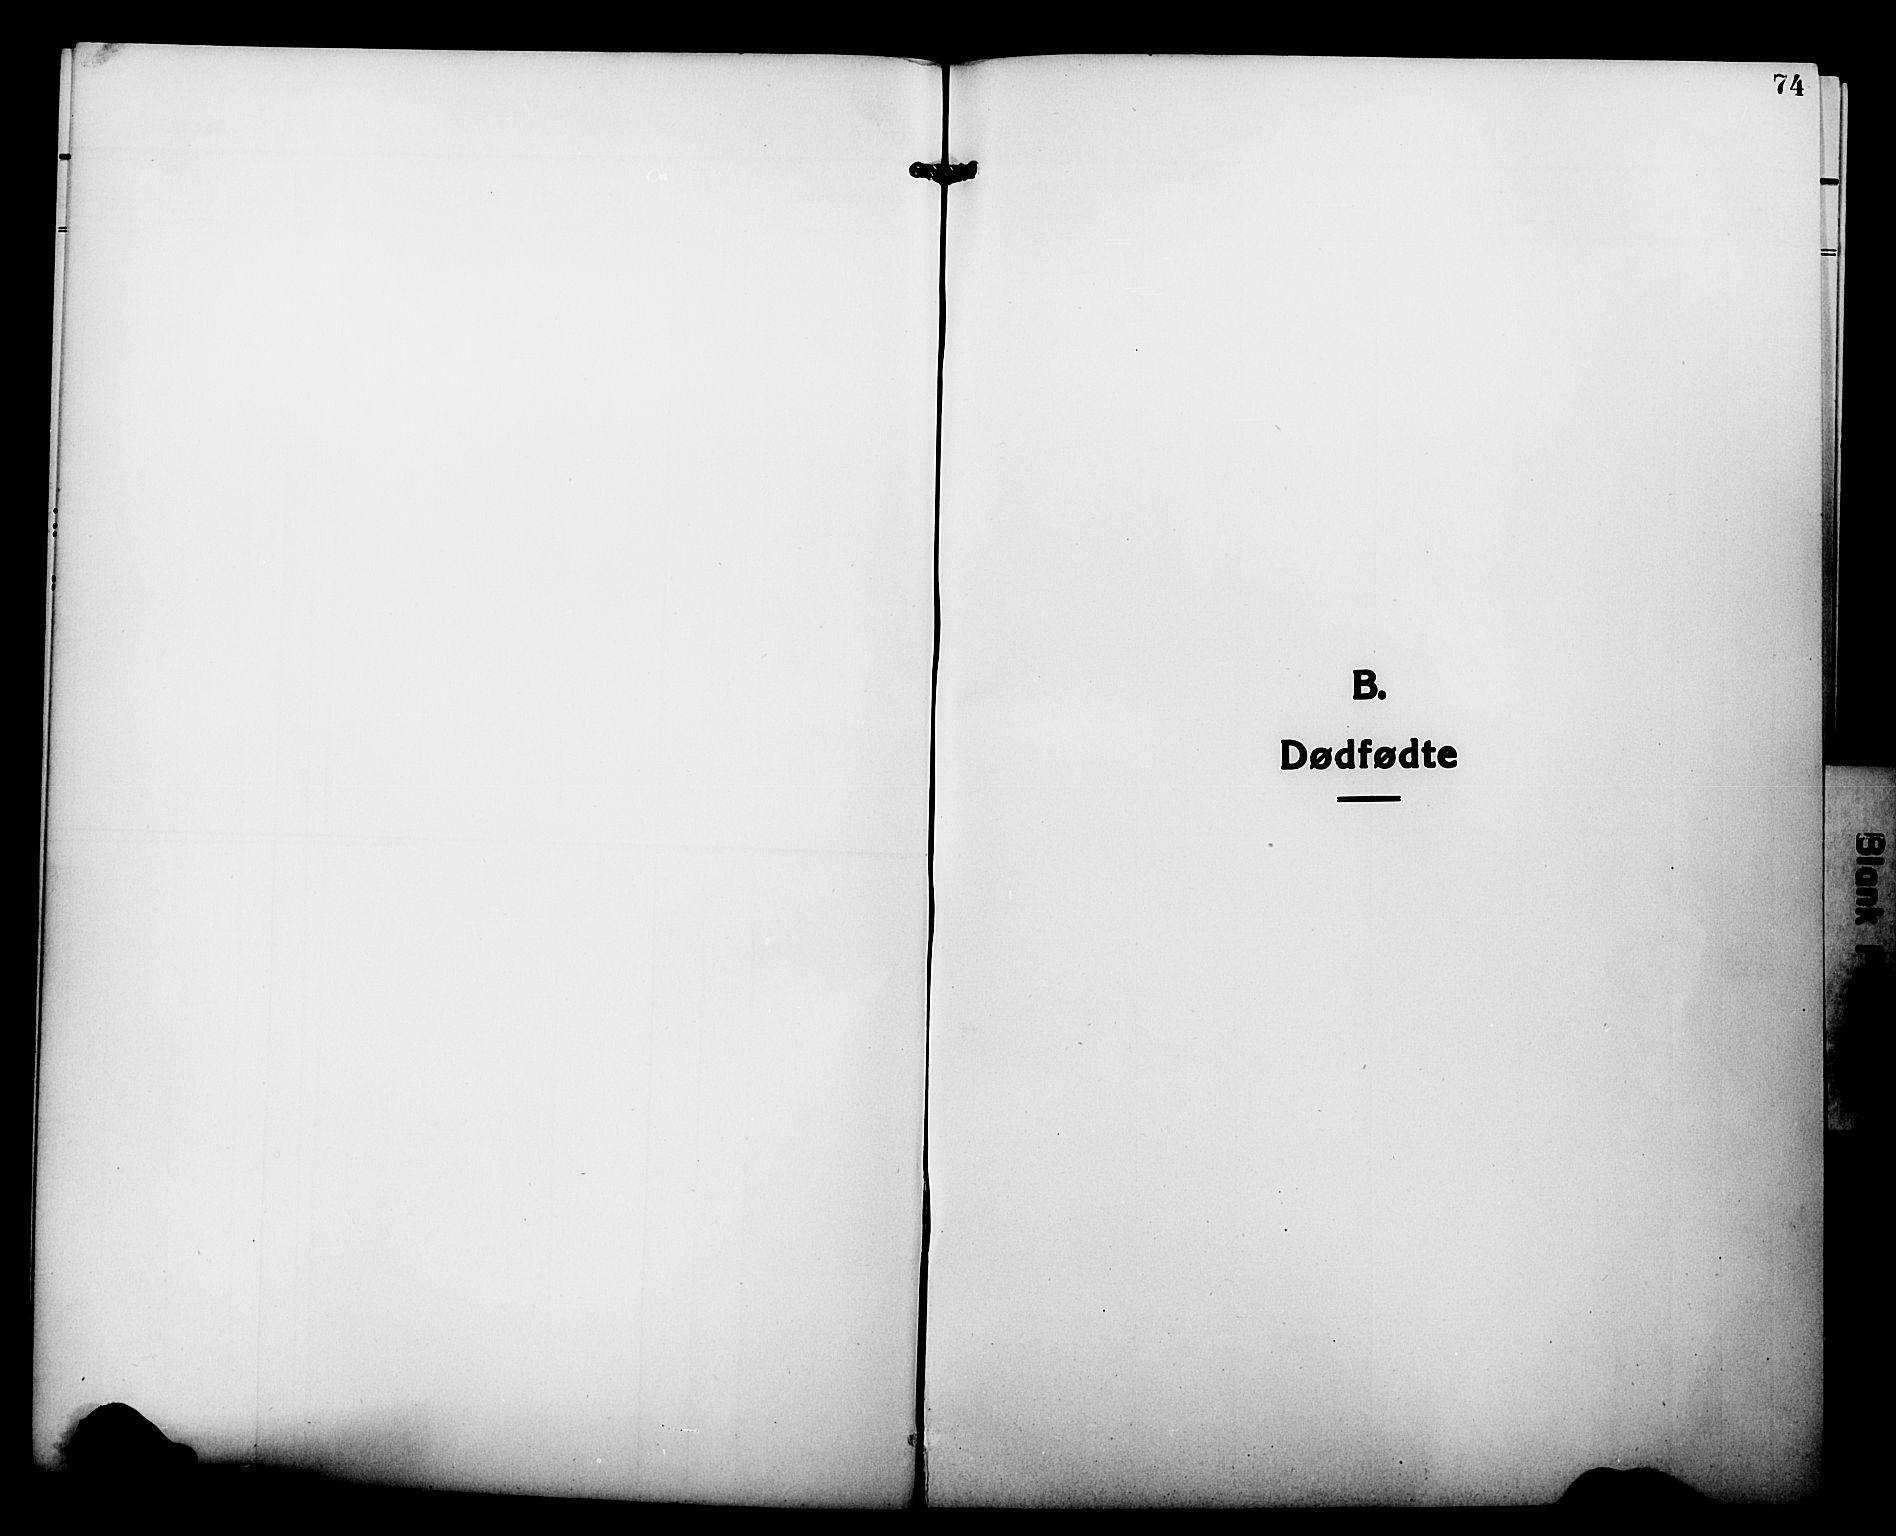 SATØ, Tranøy sokneprestkontor, I/Ia/Iab/L0015klokker: Klokkerbok nr. 15, 1918-1930, s. 74